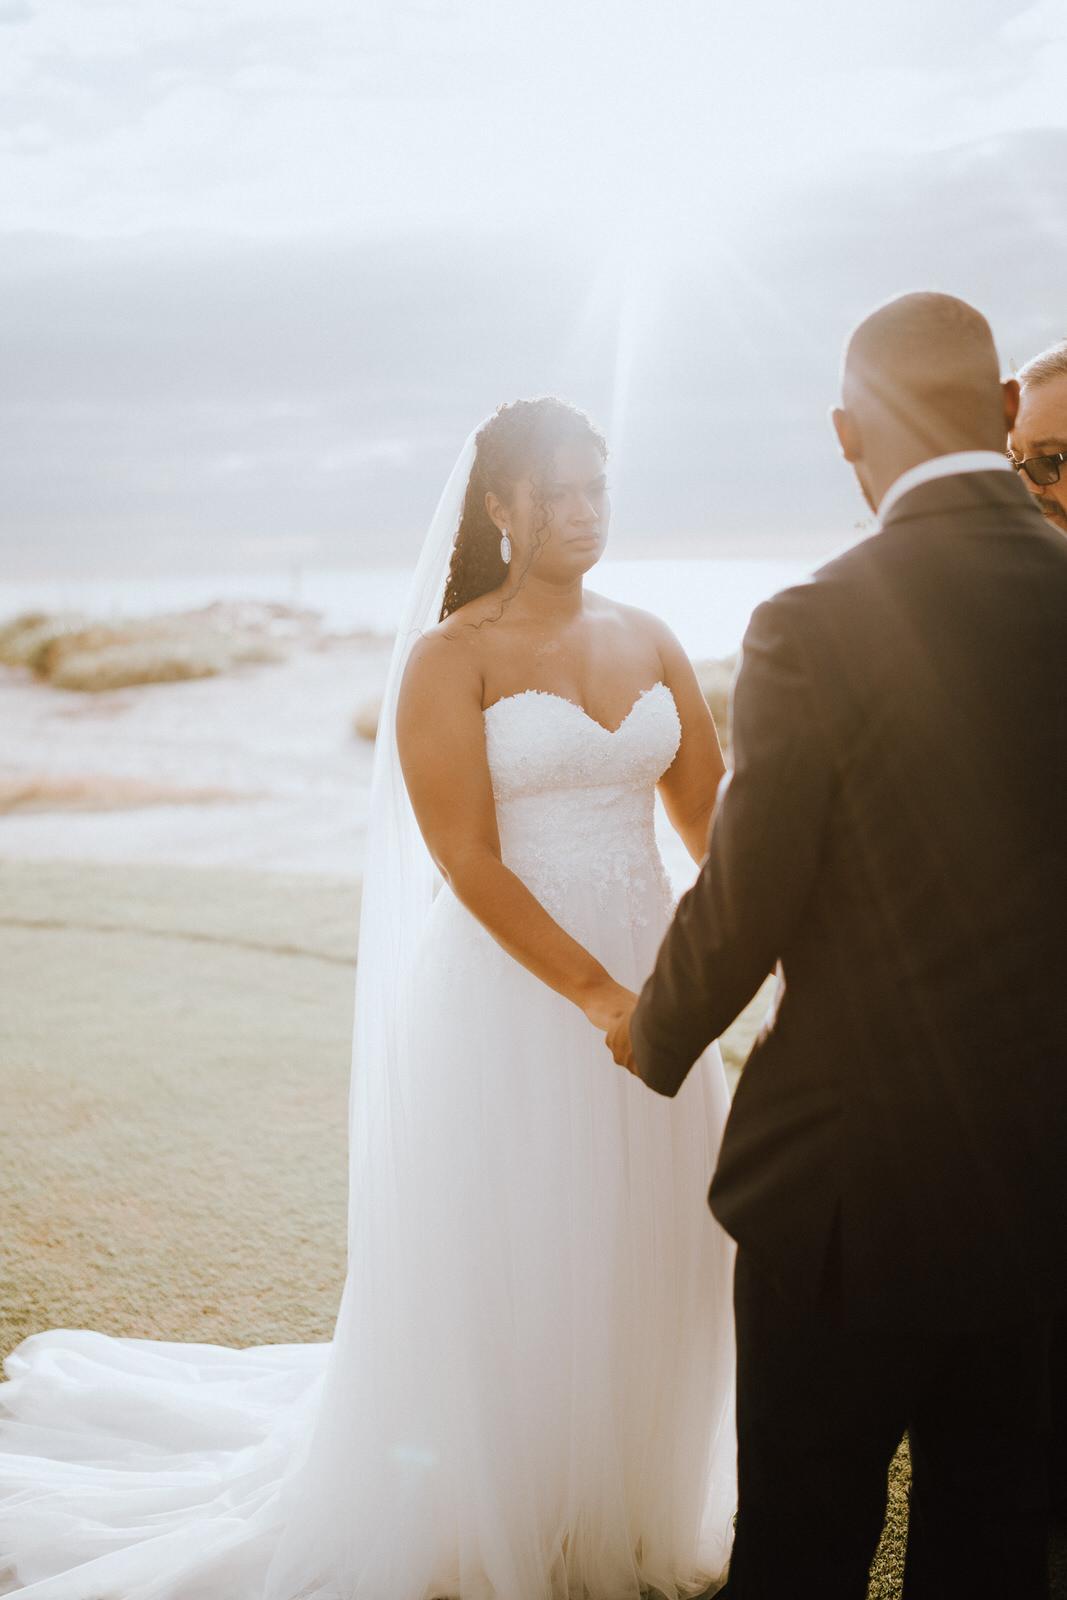 South Seas Island Resort Elopement- Alyana and Shawn- Michelle Gonzalez Photography-451.JPG